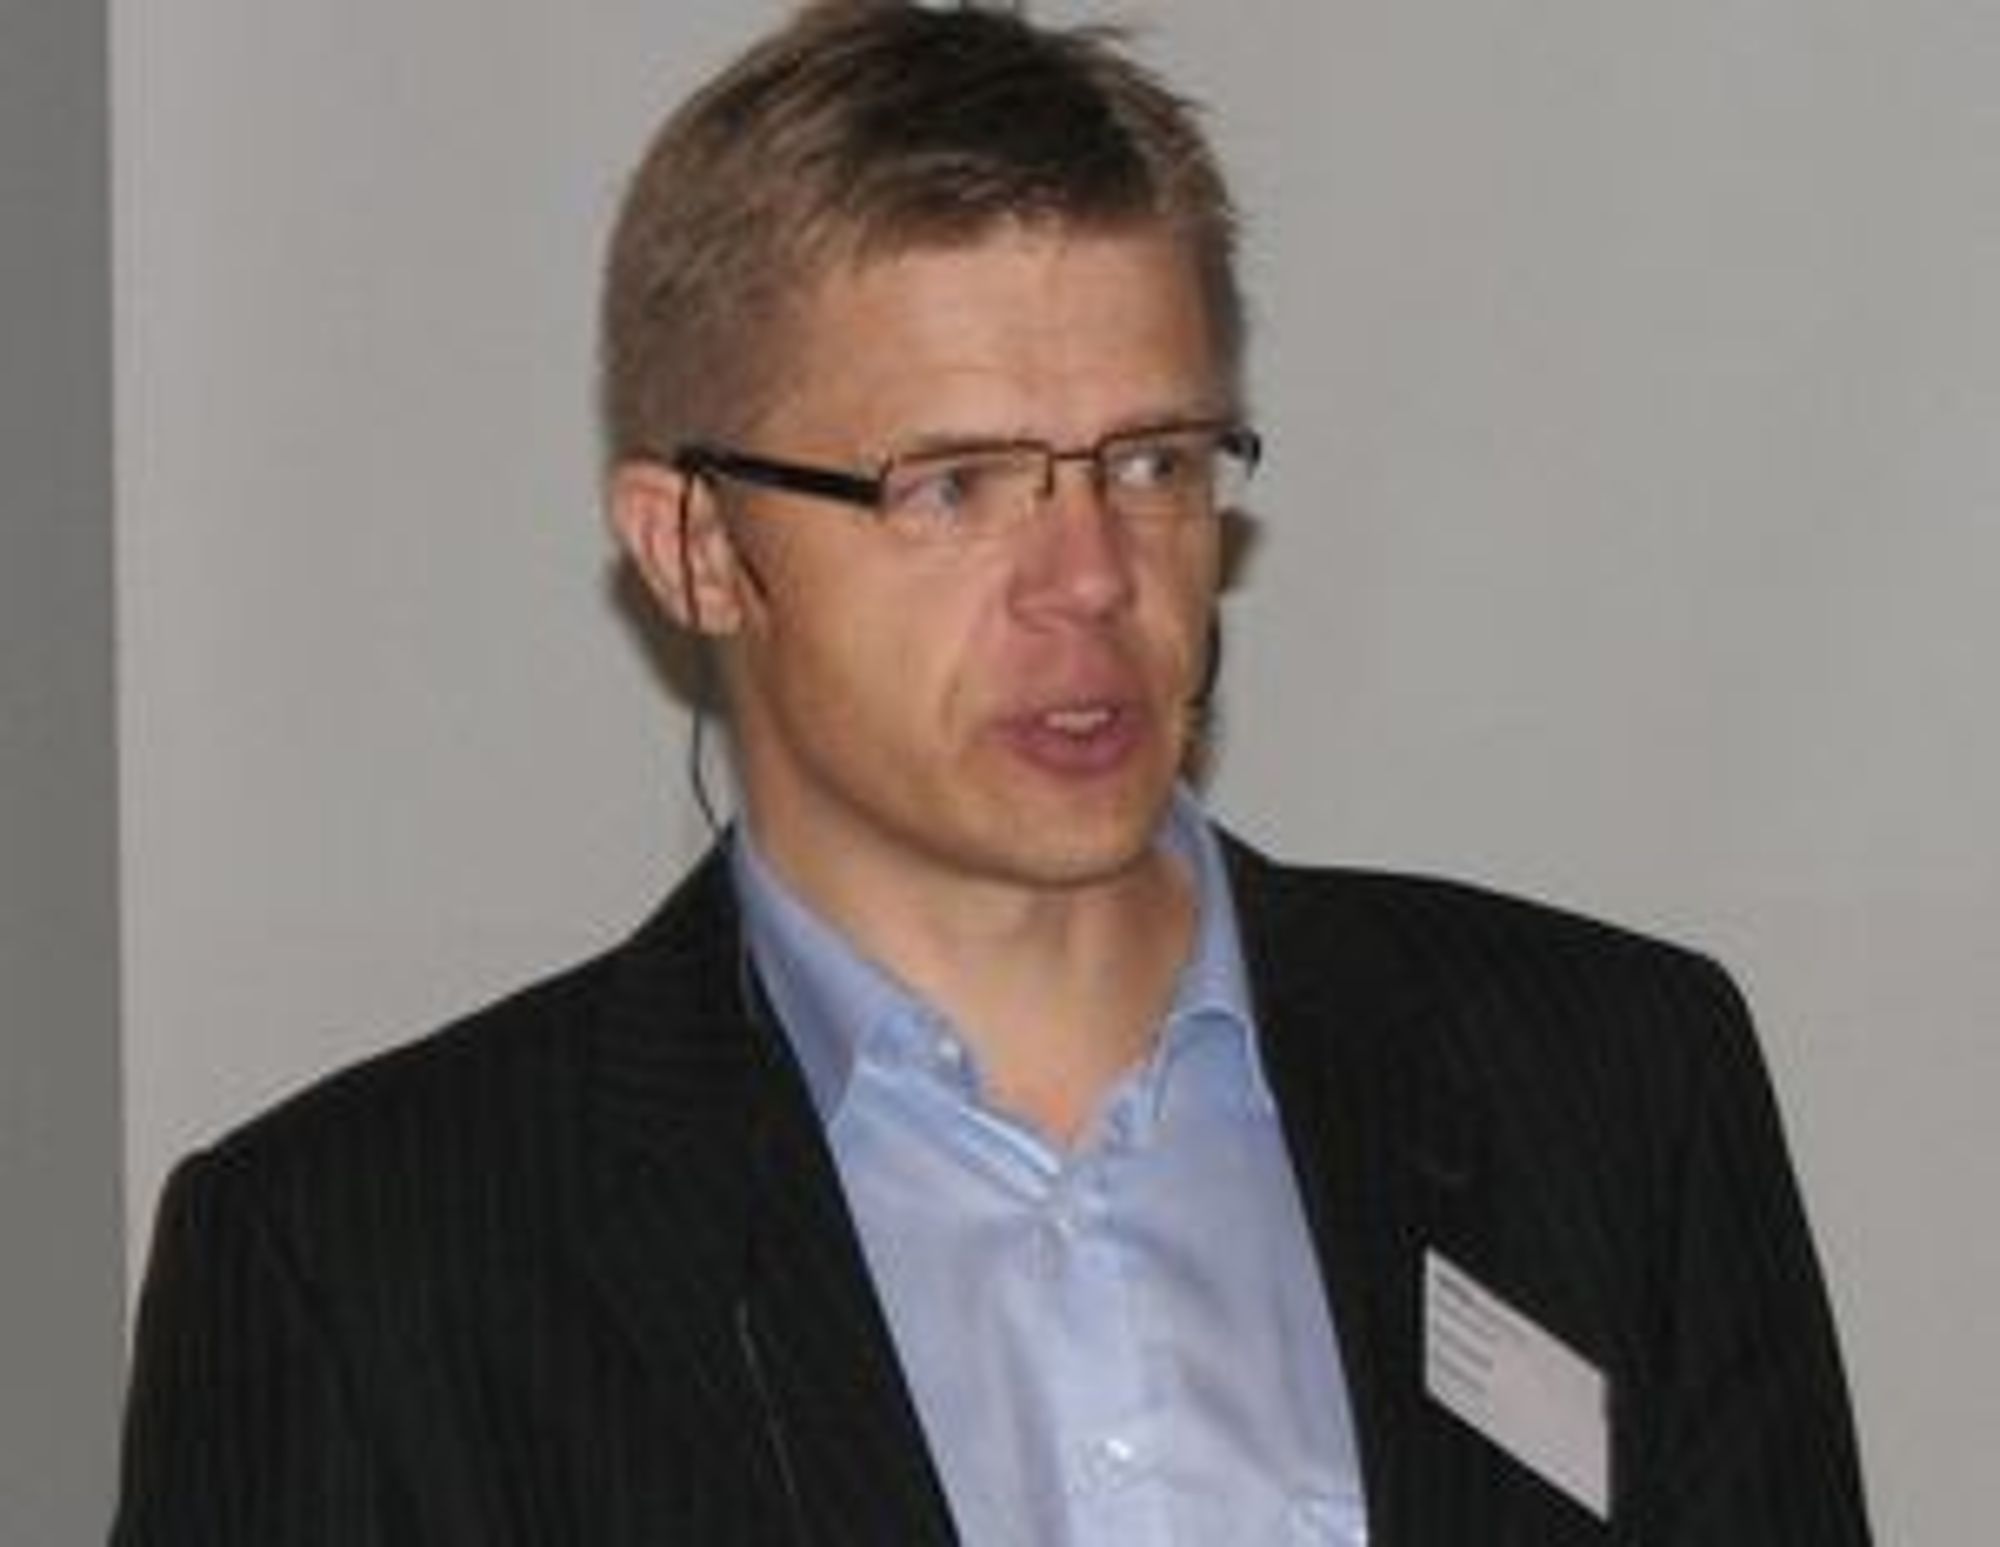 Frode Saastad i Telenor mener IPTV over tid vil smelte sammen med webtv.